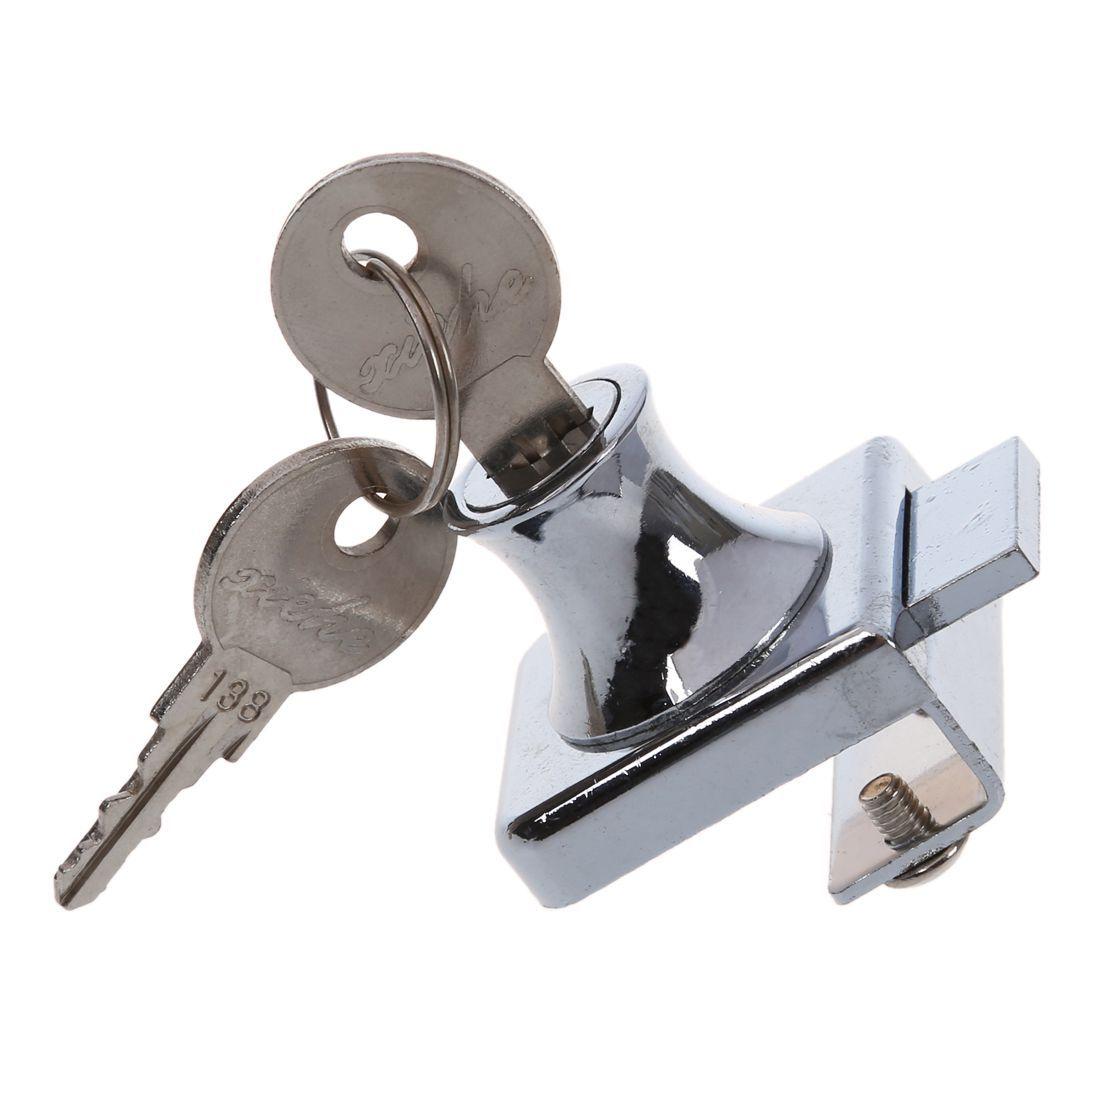 HHTL-XieHe Stainless Stell Showcase Display Cabinet Glass Door Lock w 2 Keys